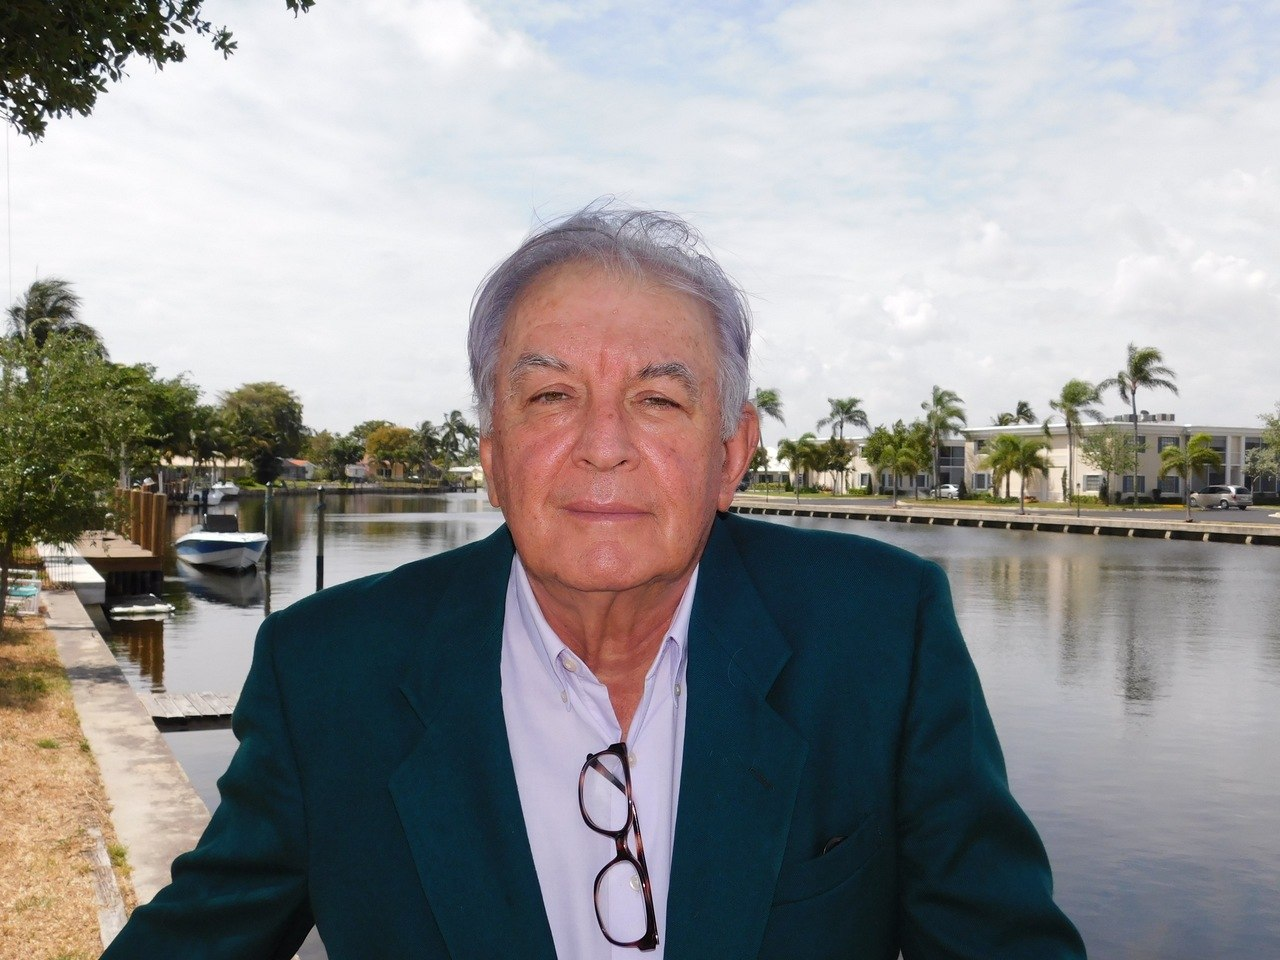 Gaétan Roy, Courtier en Immobilier commercial en Floride